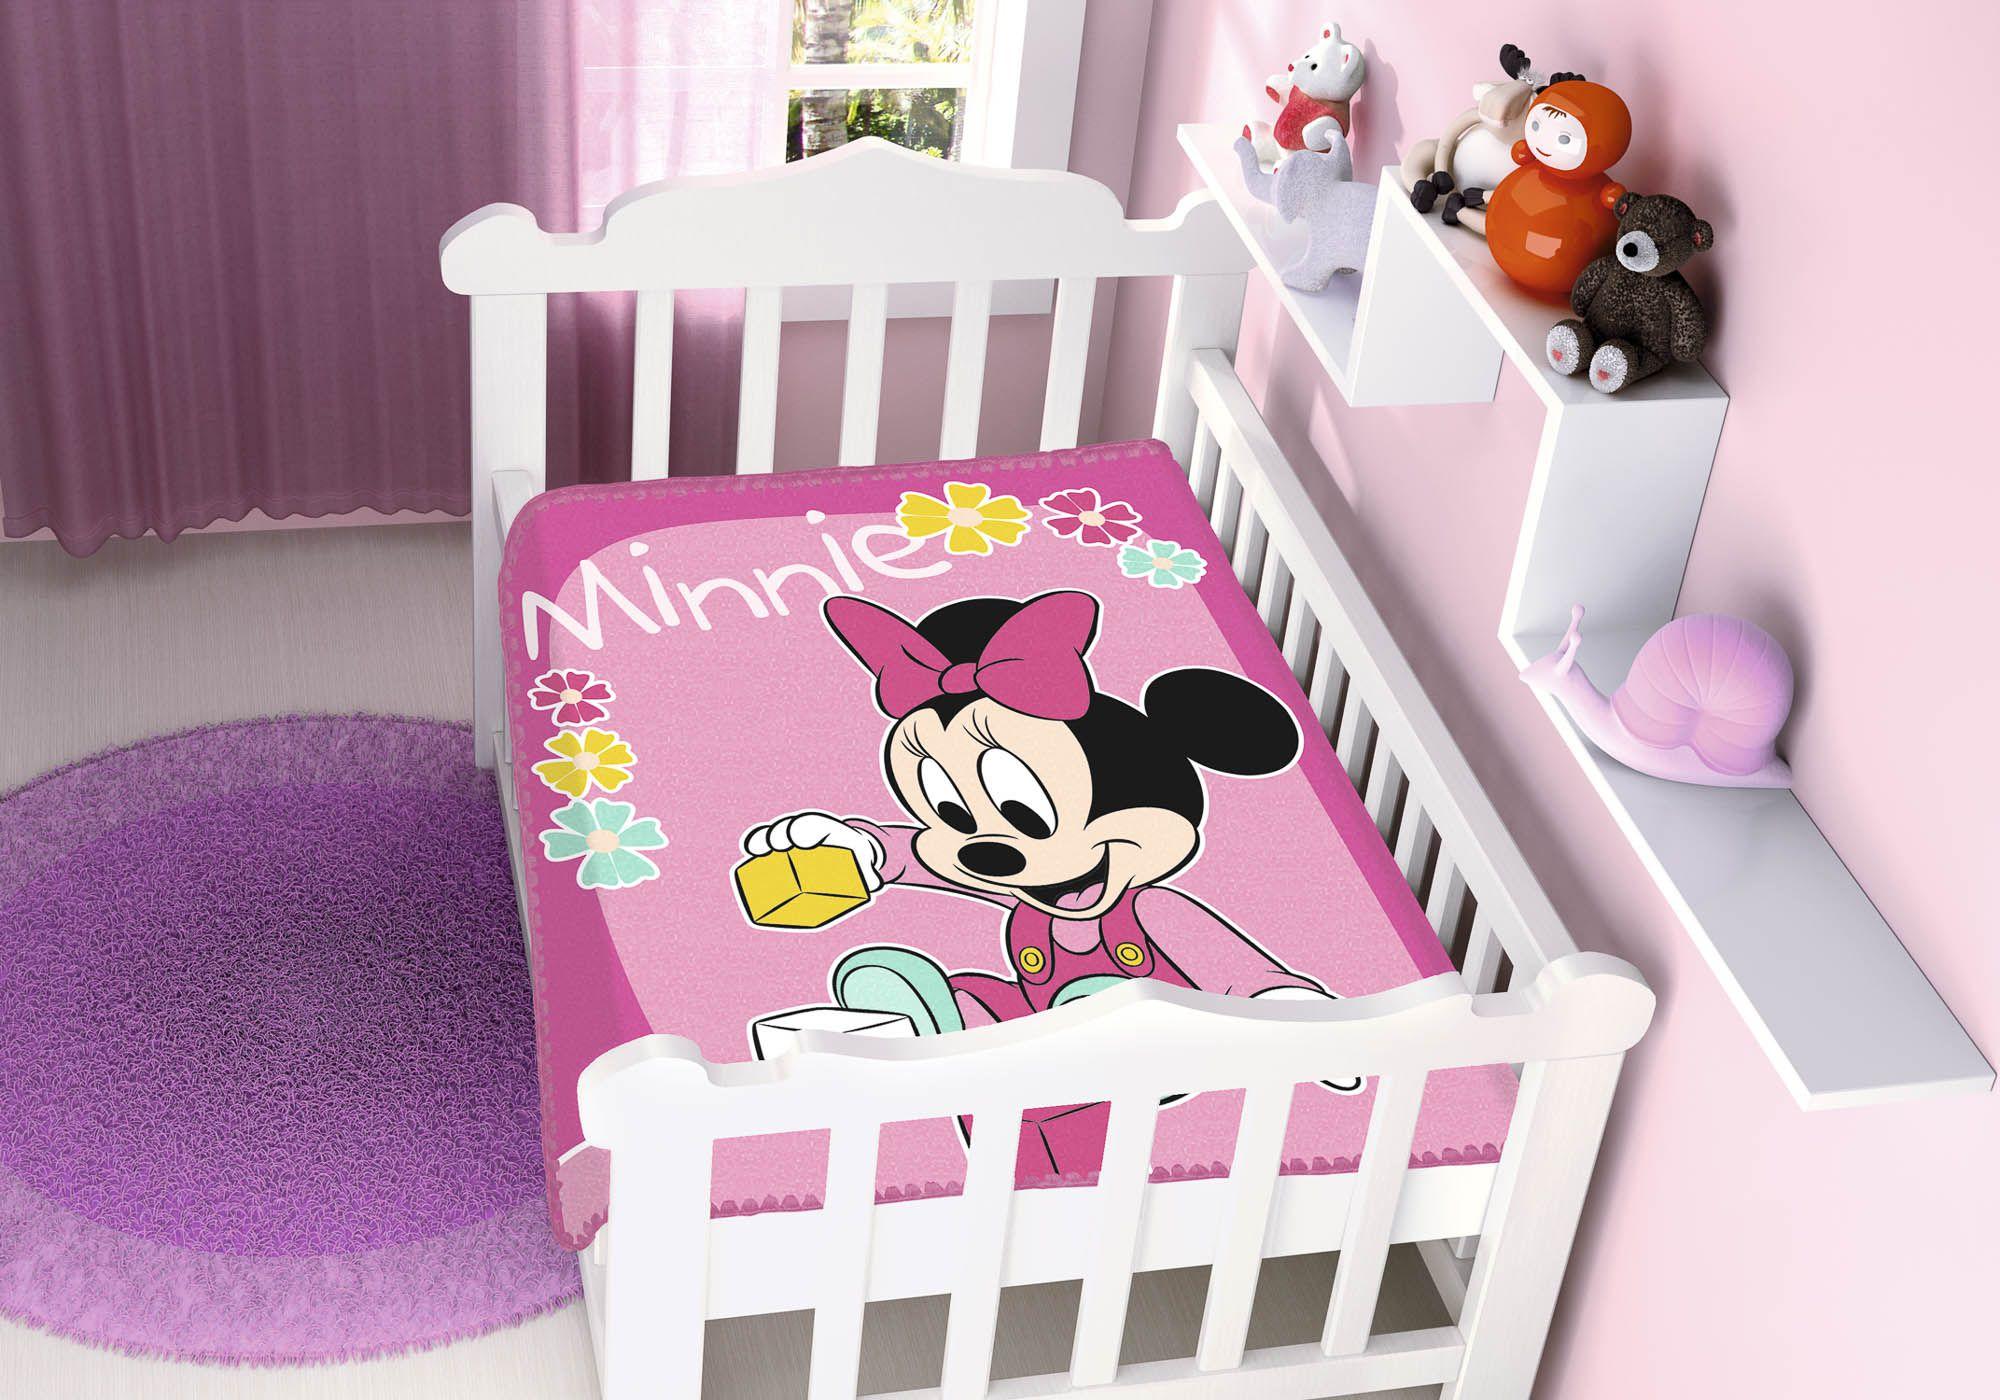 Cobertor Jolitex Raschel Infantil 0,90x1,10m Disney Minnie Brincando